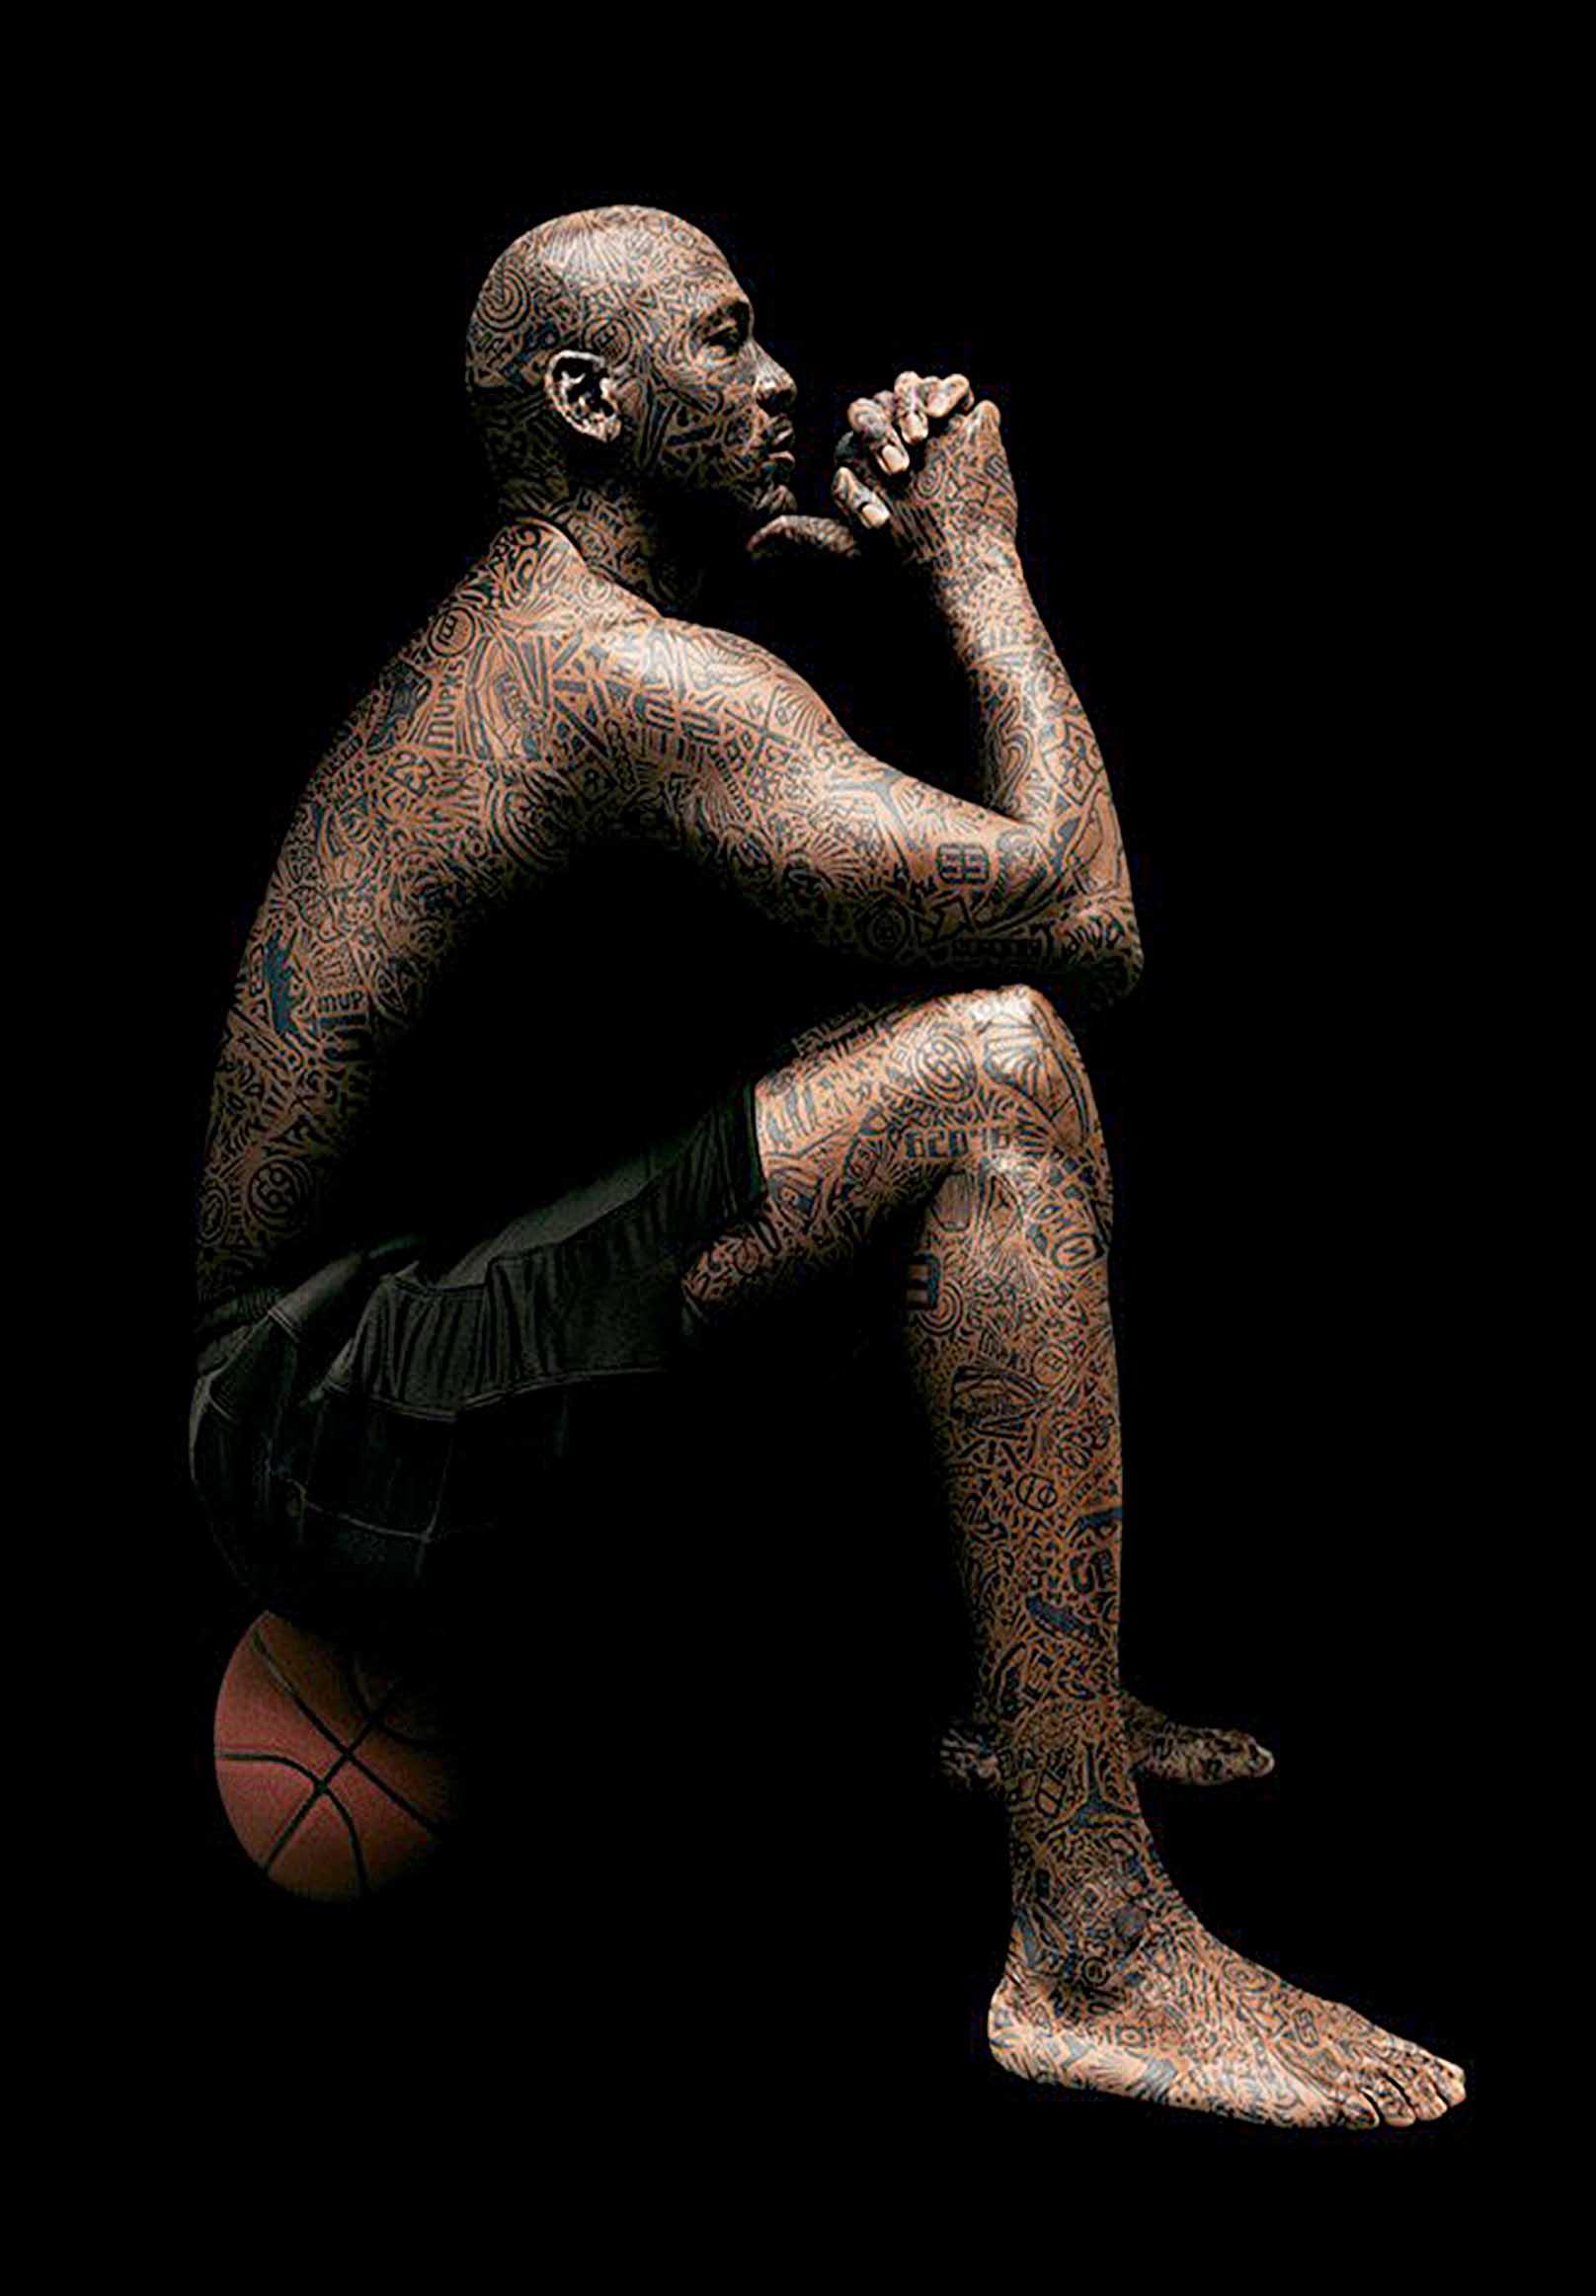 Chicago Bulls Michael Jordan Canvas Tablo (Nba-canvas-jordanmj4)